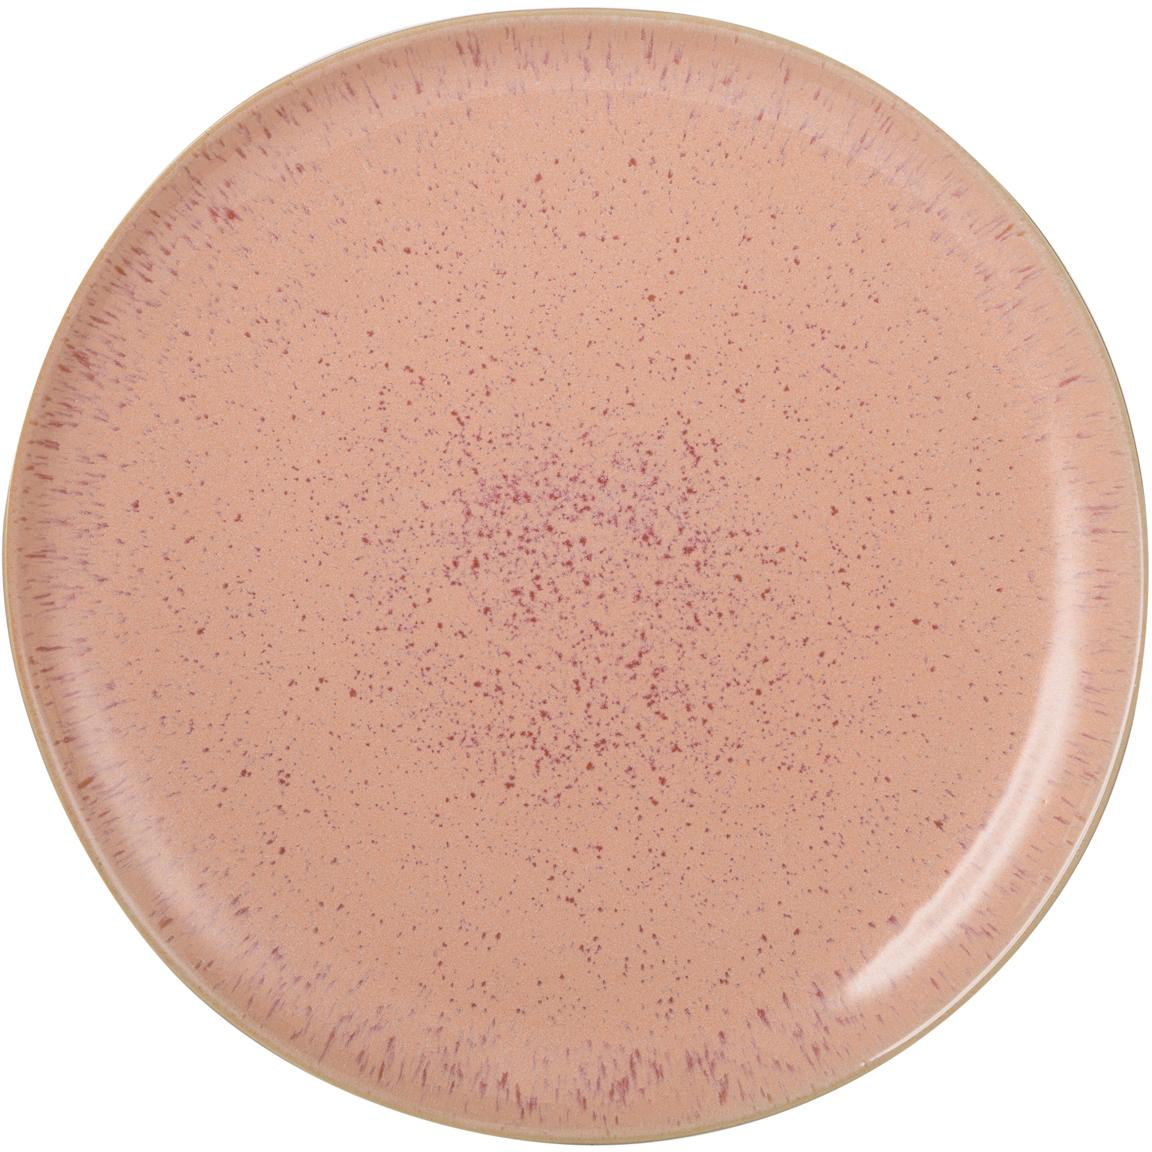 Plato llano artesanal Areia, Gres, Tonos rojos, blanco crudo, beige claro, Ø 28 cm